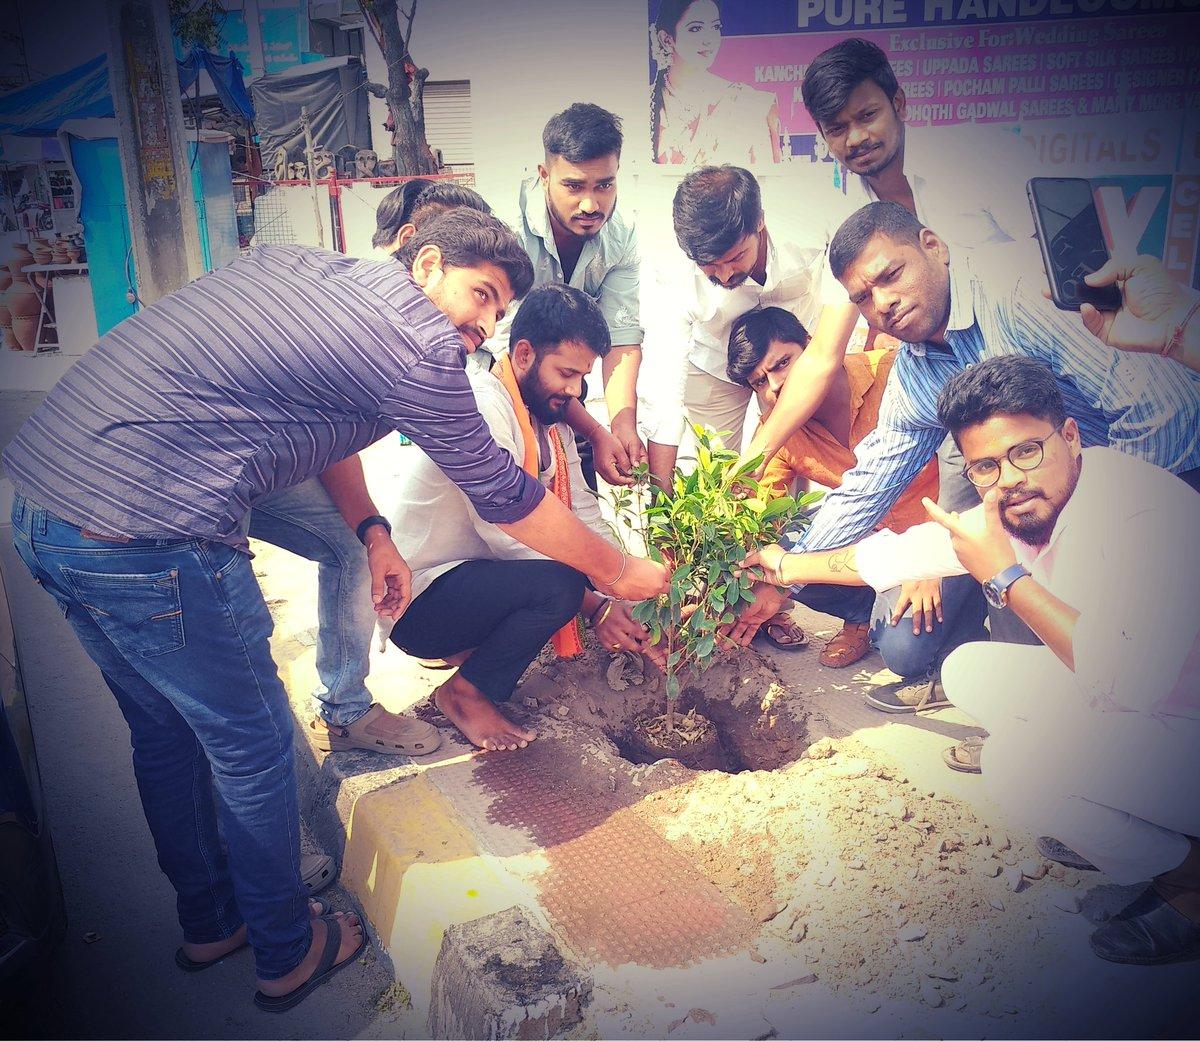 On the occasion of Hon'ble CM Sri KCR garu, planted a sapling as part of #KotiVriksharchana  #HappyBirthdayKCR Sir @KTRTRS @MPsantoshtrs @GelluSrinuTRS  . . . ప్రేమతో మీ, షేర్ రామన్ యాదవ్🙏 TRSV రాష్ట్ర నాయకులు.